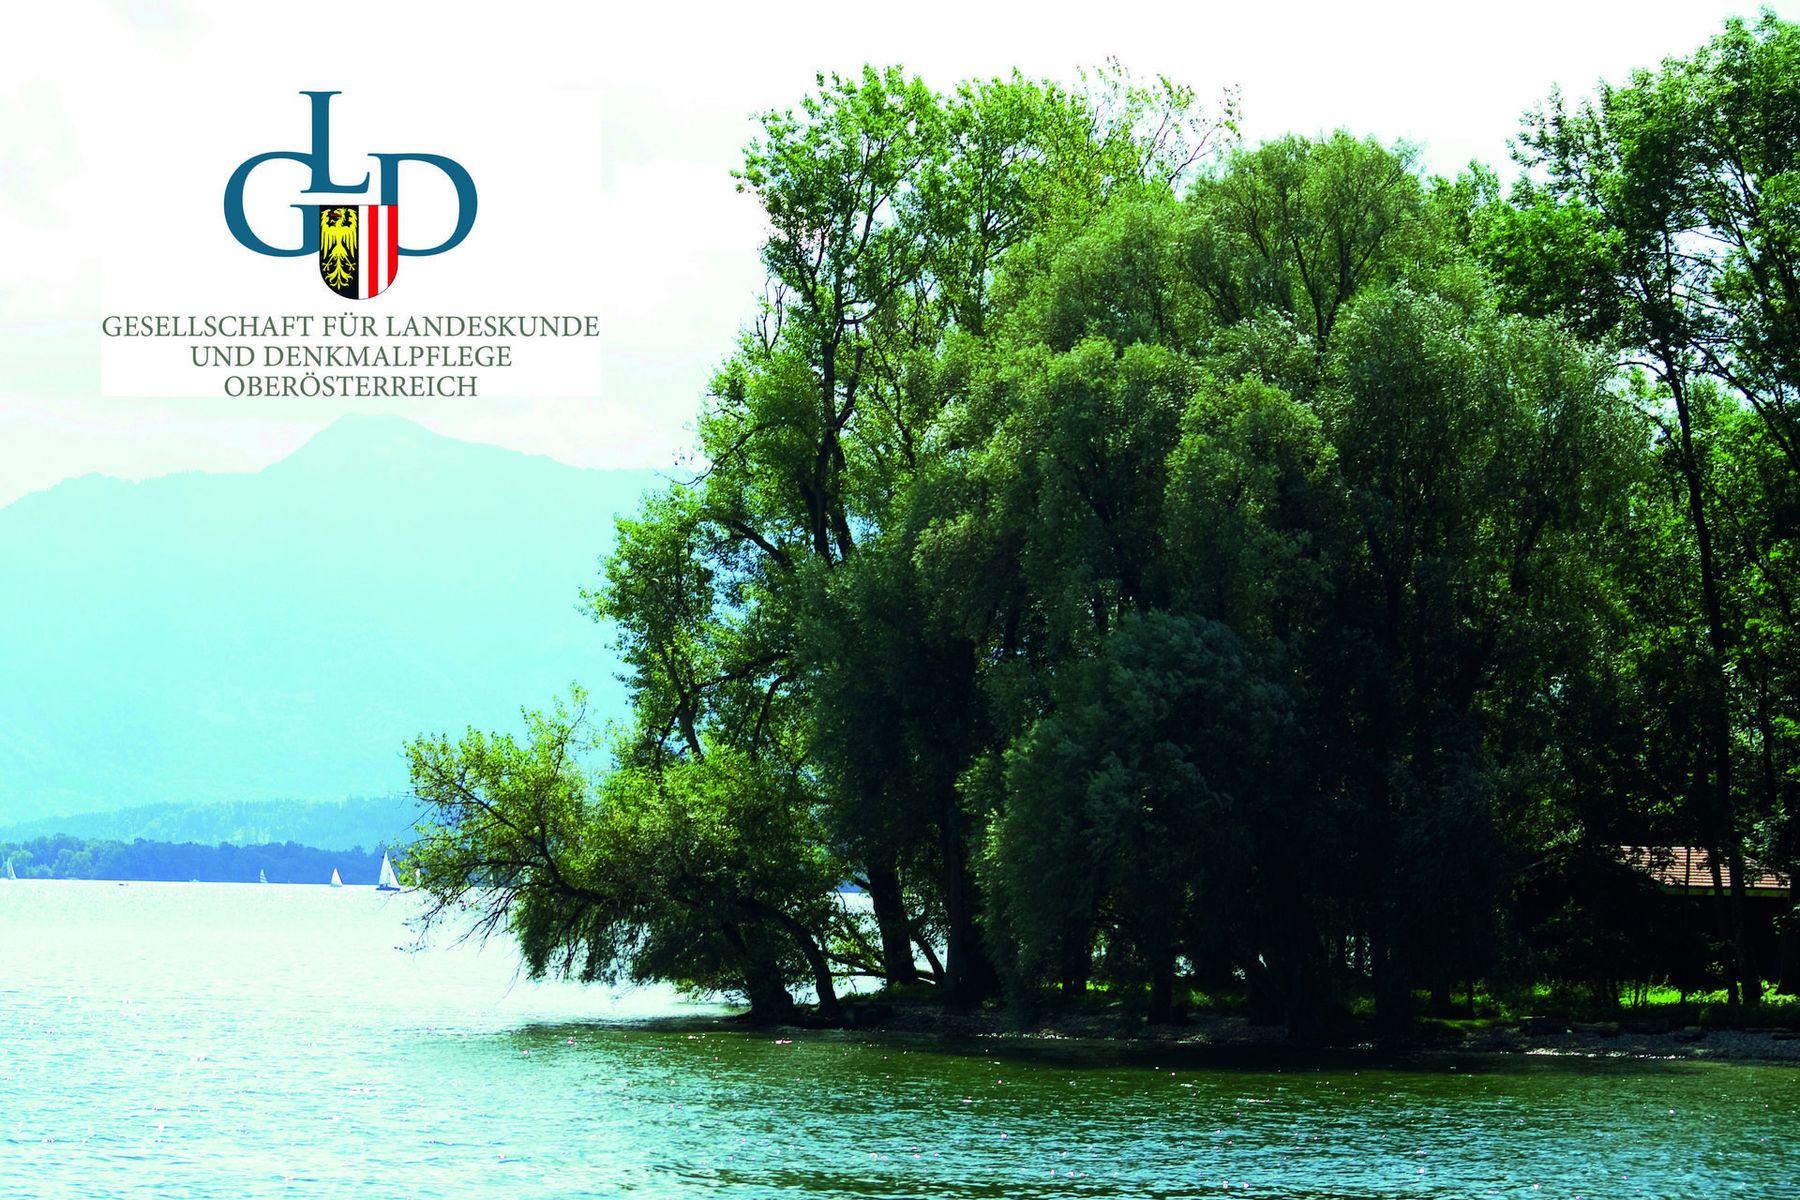 Herreninsel mitGDL logo 01